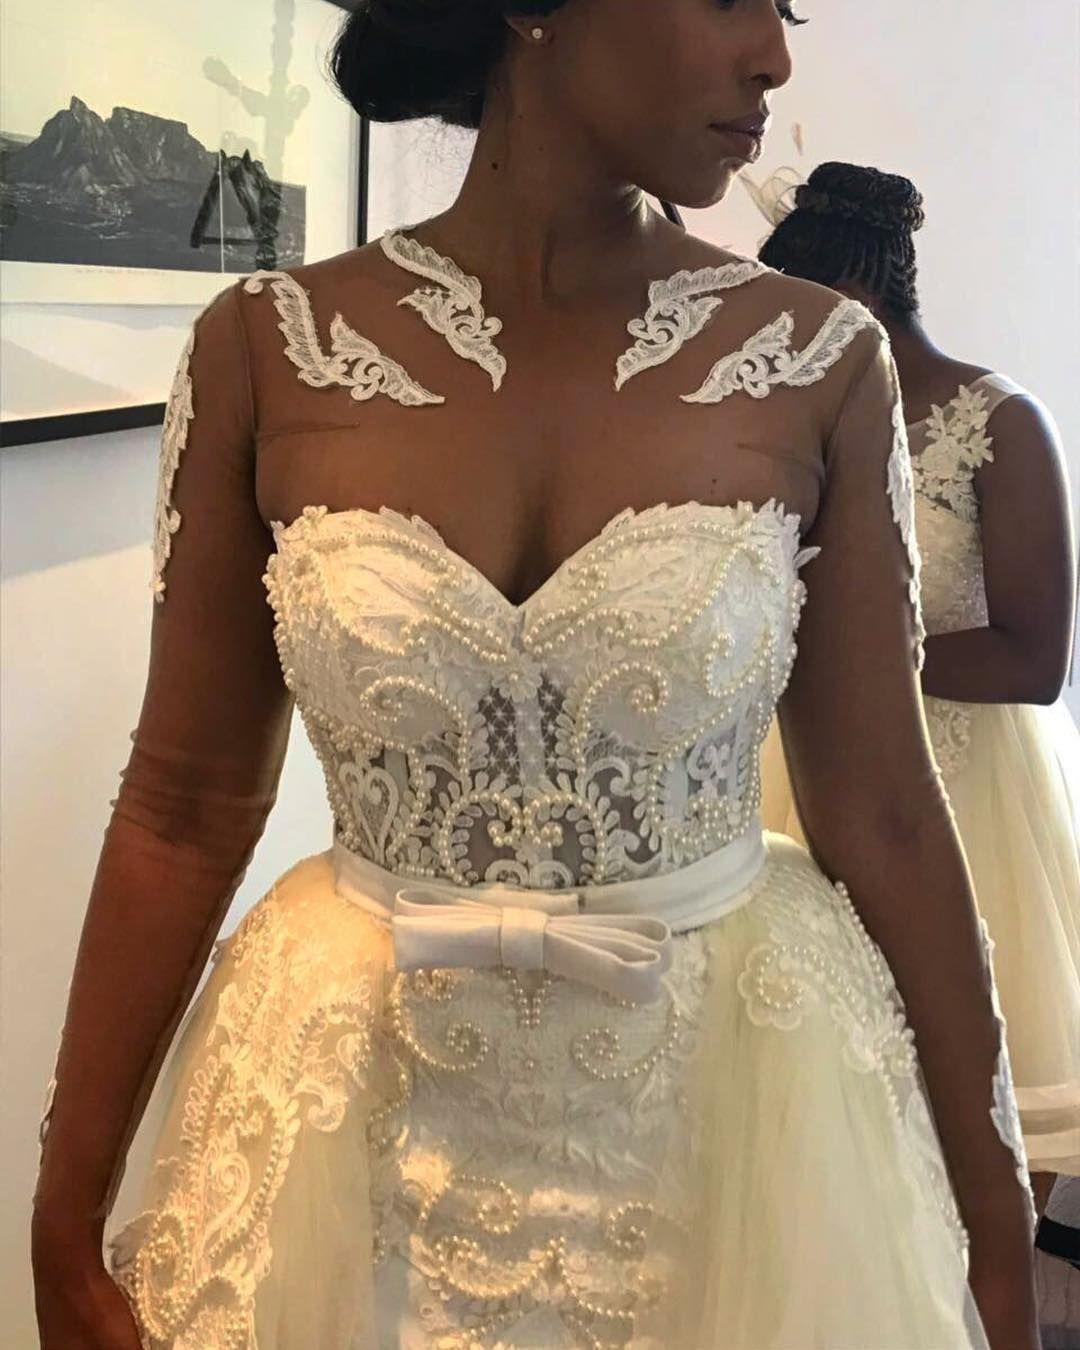 Orapeleng Modutle Wedding Dress Prices 53 Off Plykart Com,Macy Dresses For Weddings